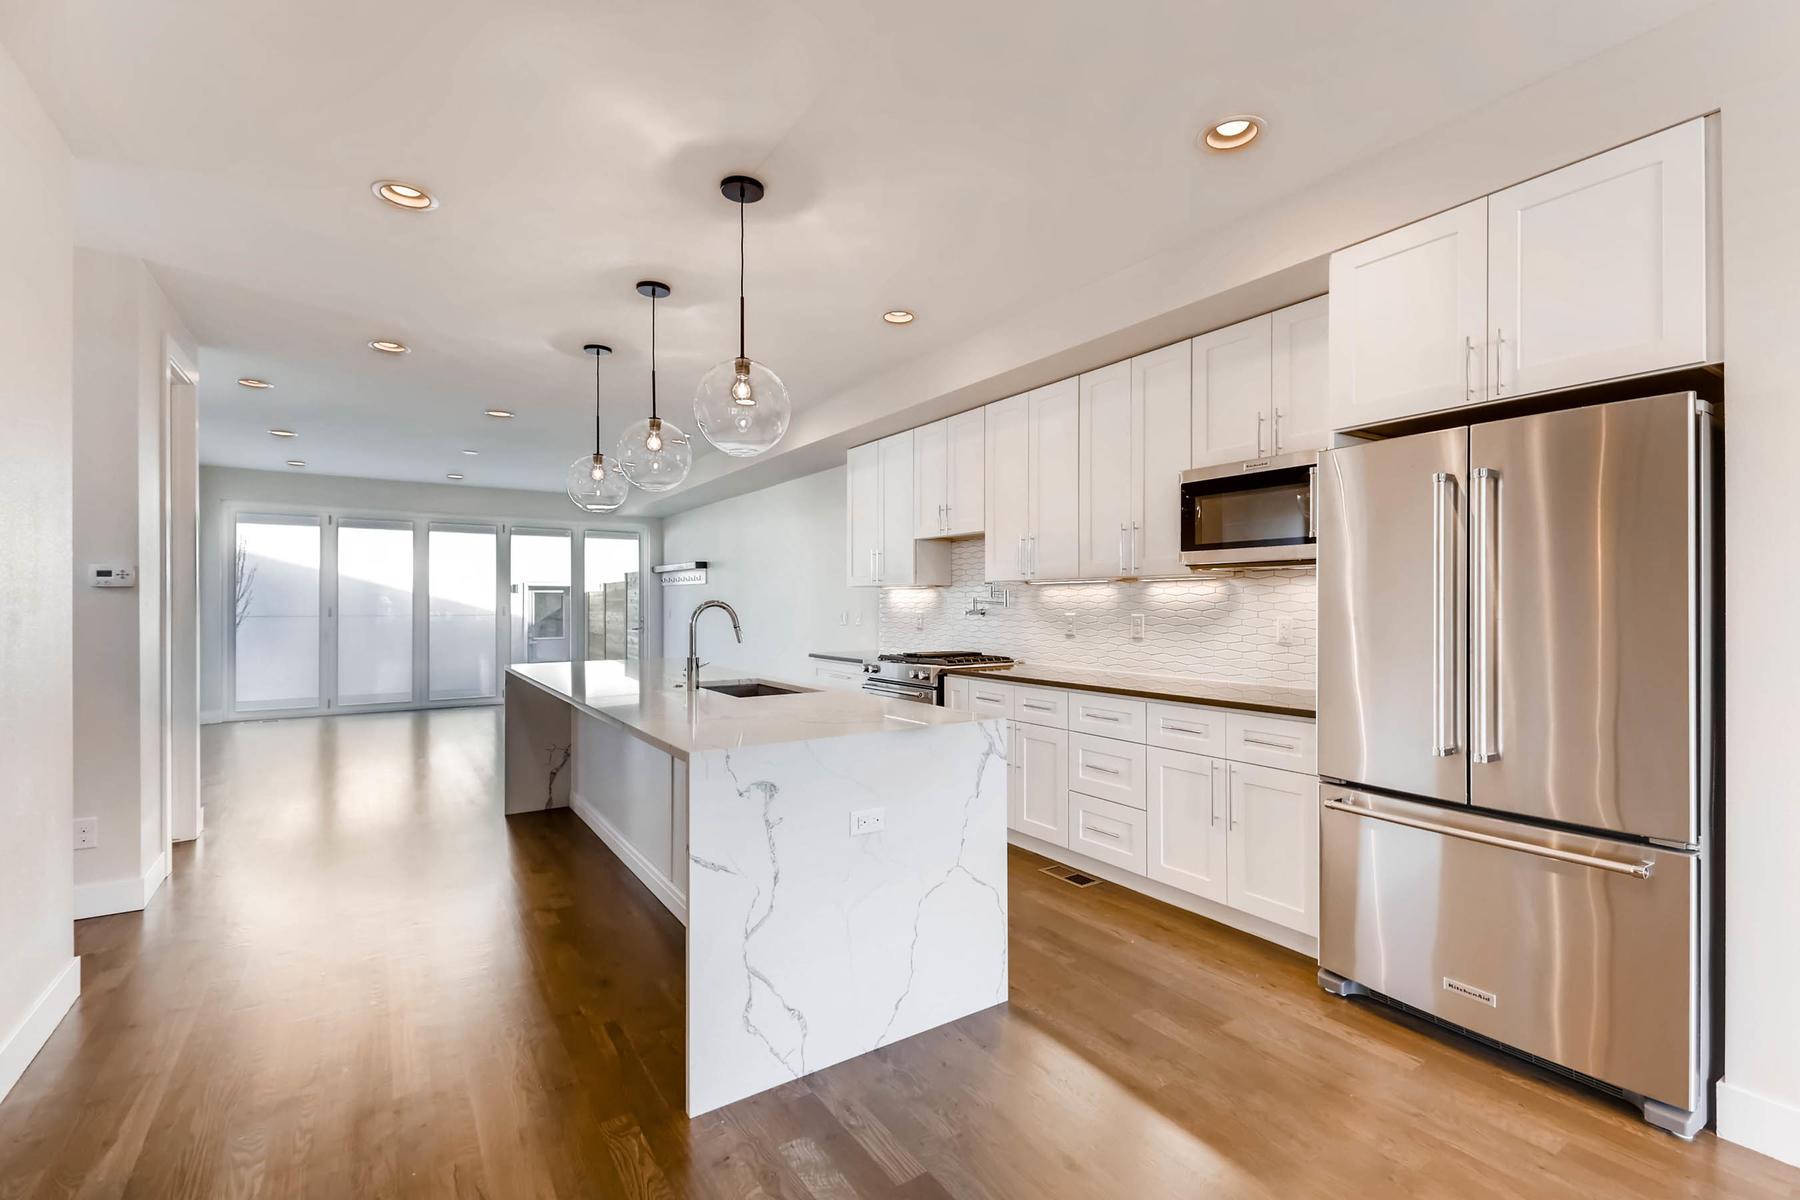 3000 S Elati Street Englewood-MLS_Size-007-5-Kitchen-1800x1200-72dpi.jpg